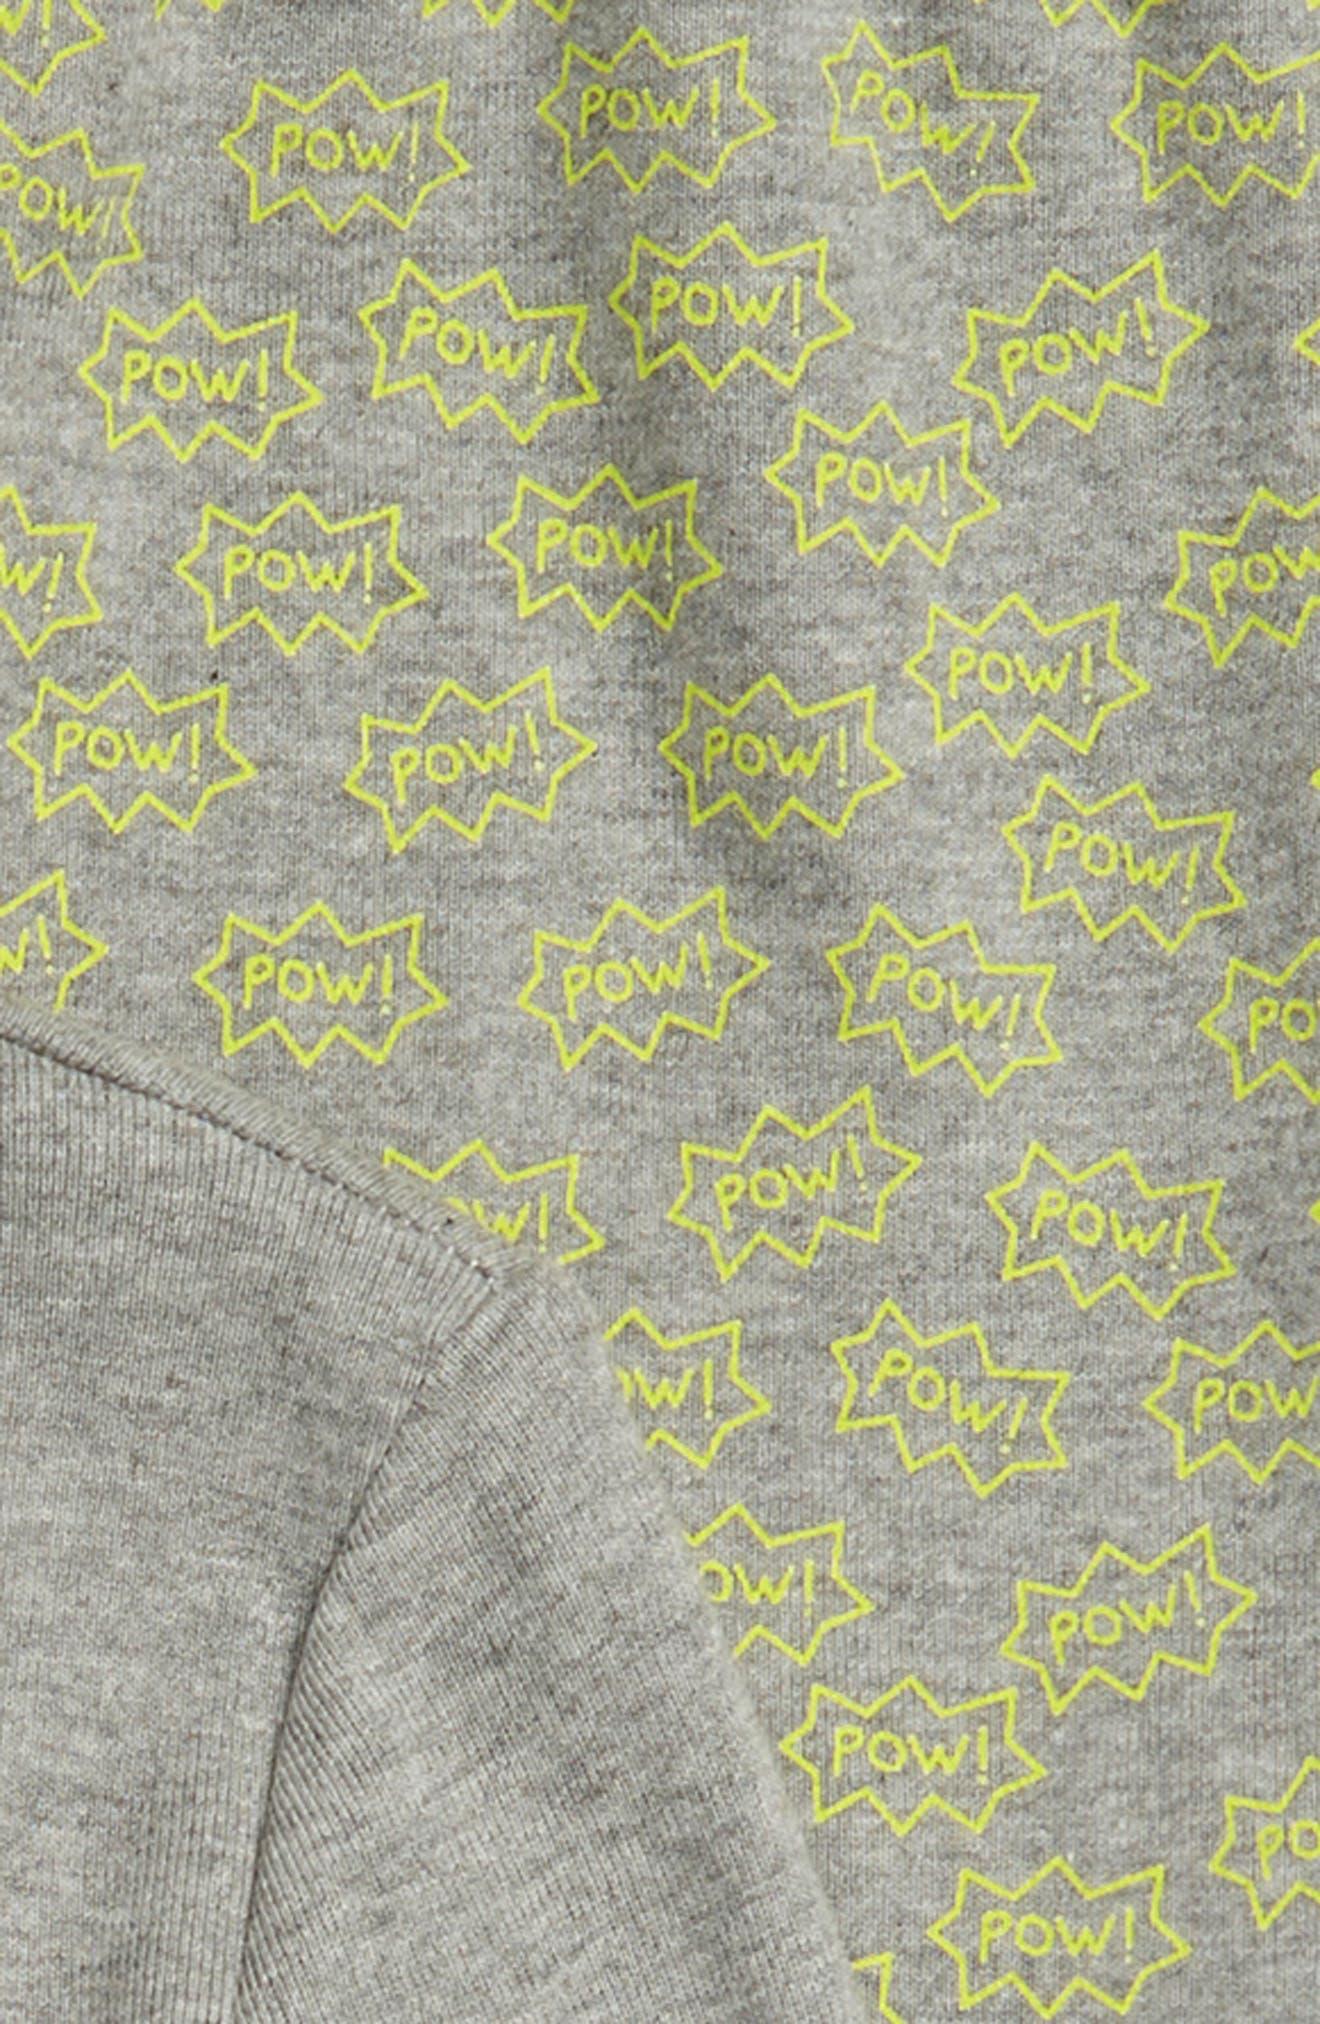 Glow in the Dark Two-Piece Fitted Pajamas,                             Alternate thumbnail 2, color,                             GREY MEDIUM HEATHER SUPERHERO